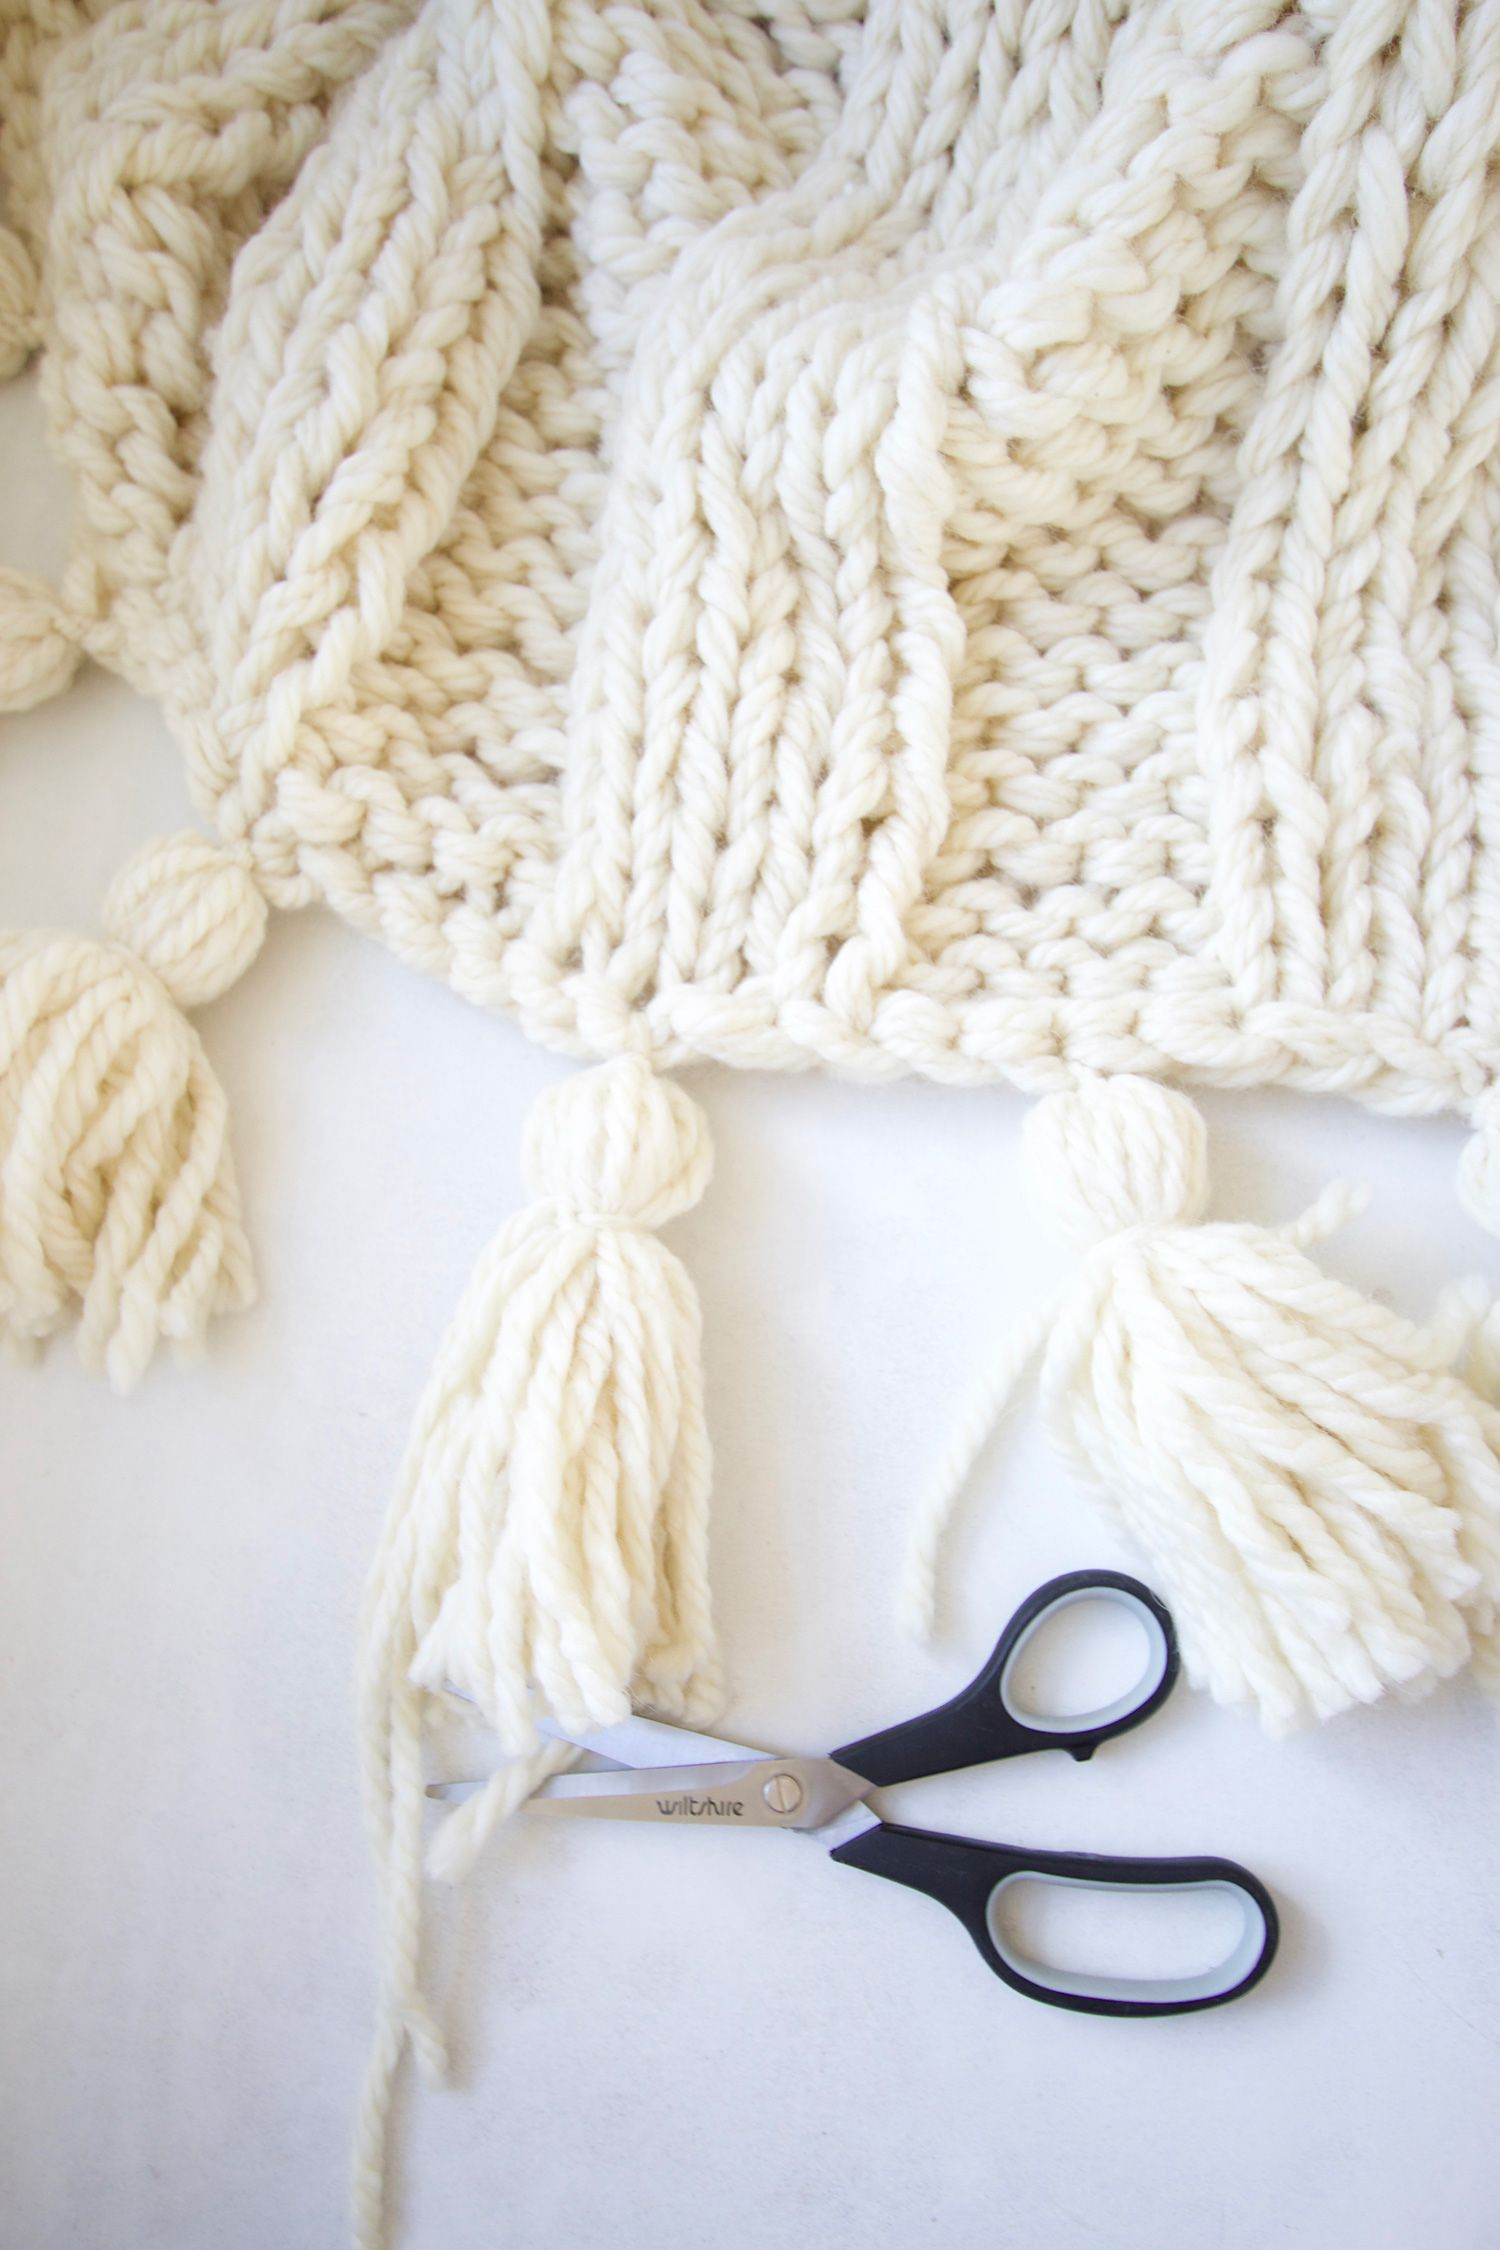 How to make a yarn tassel | Tassels, Yarns and Crochet